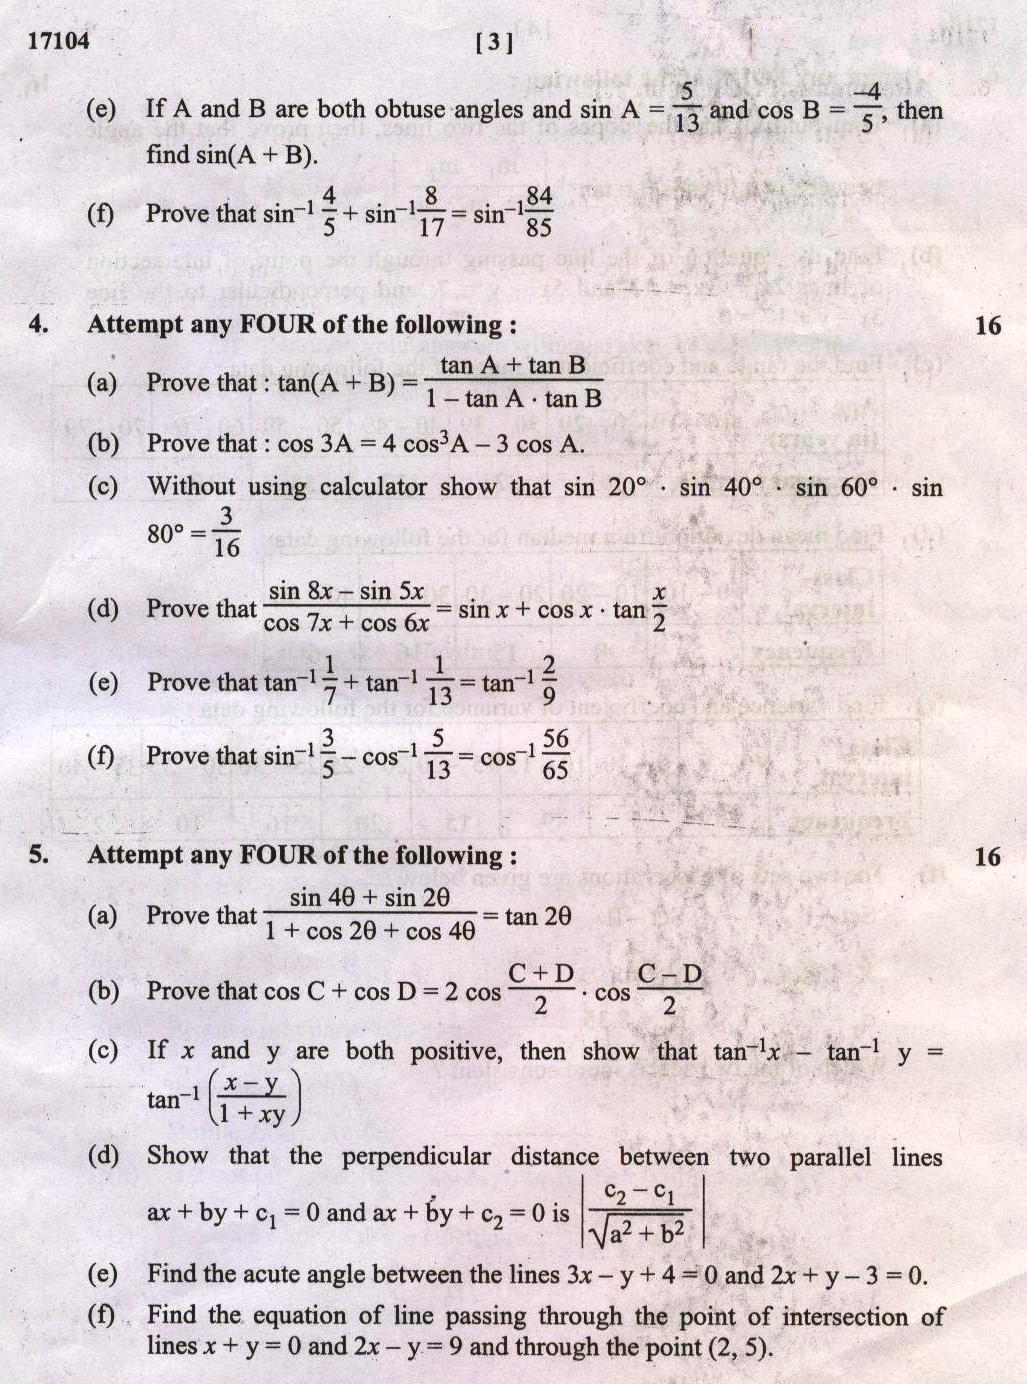 017 Thomas Jefferson Essay Example High School Admissions Test Topic Basic Mathematics All English Questions Economics Sample Scholarship Hunter Biology Magnificent Full